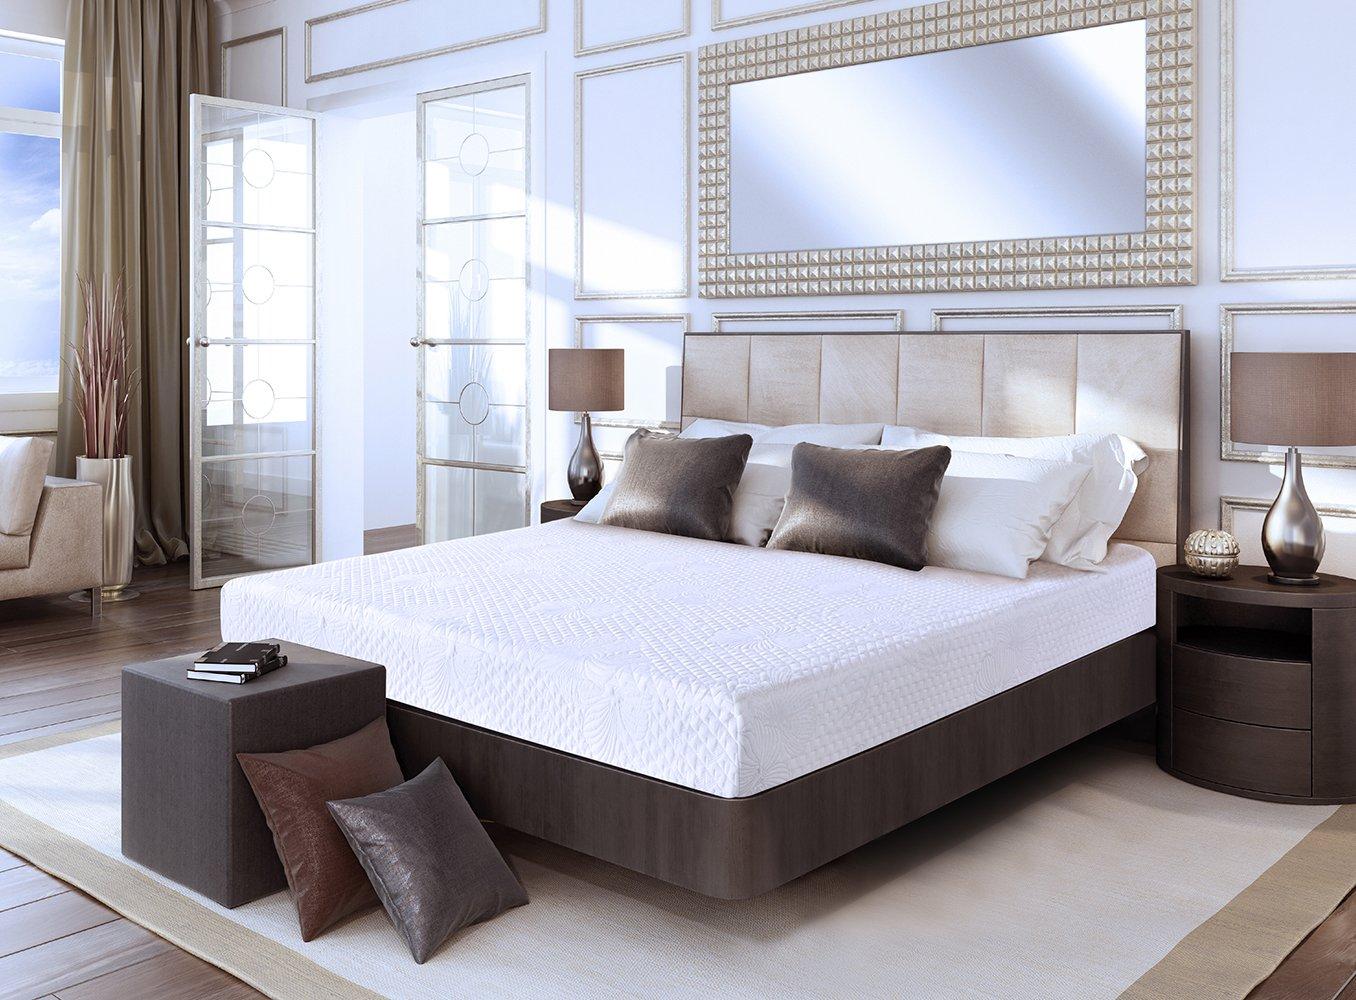 Olee Sleep 8 Inch 4 Layer Air Ventilation Memory Foam Mattress (Full) 08FM01F